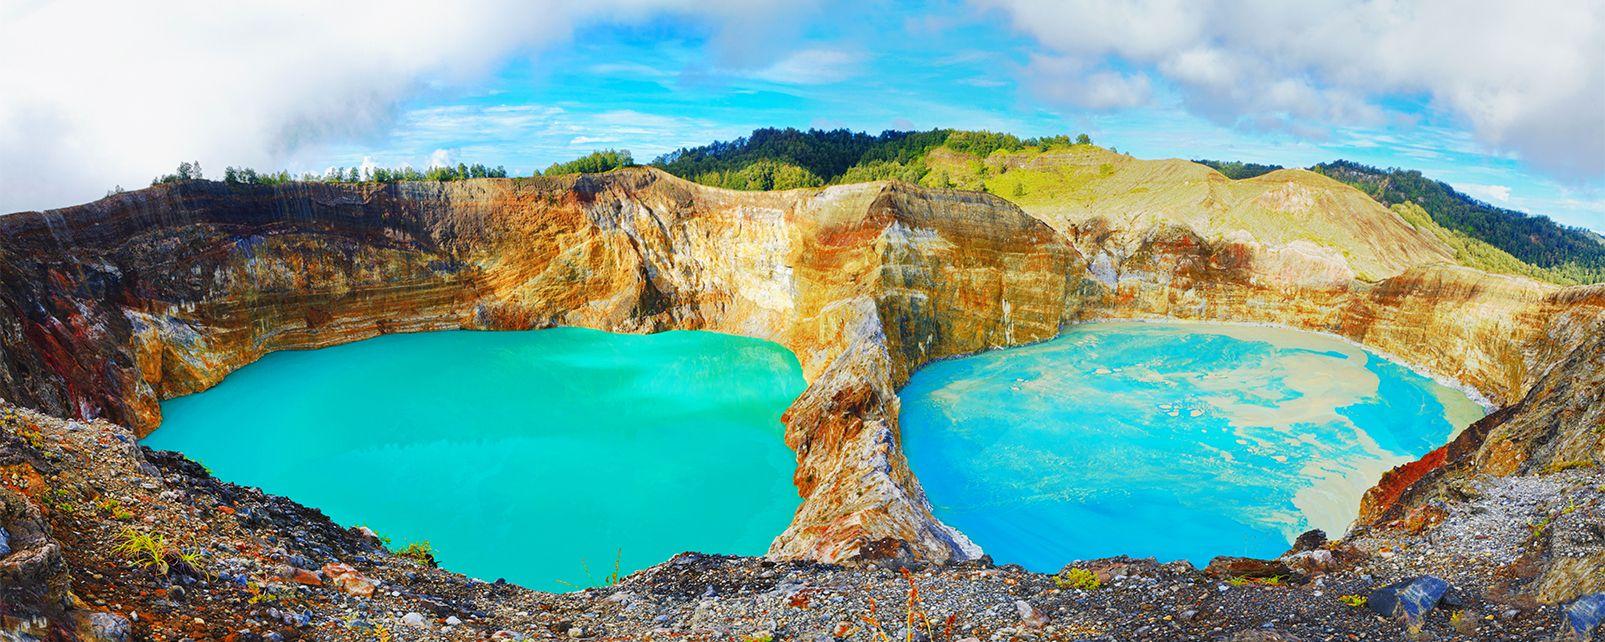 Kelimutu National Park Flor 232 S Indonesia